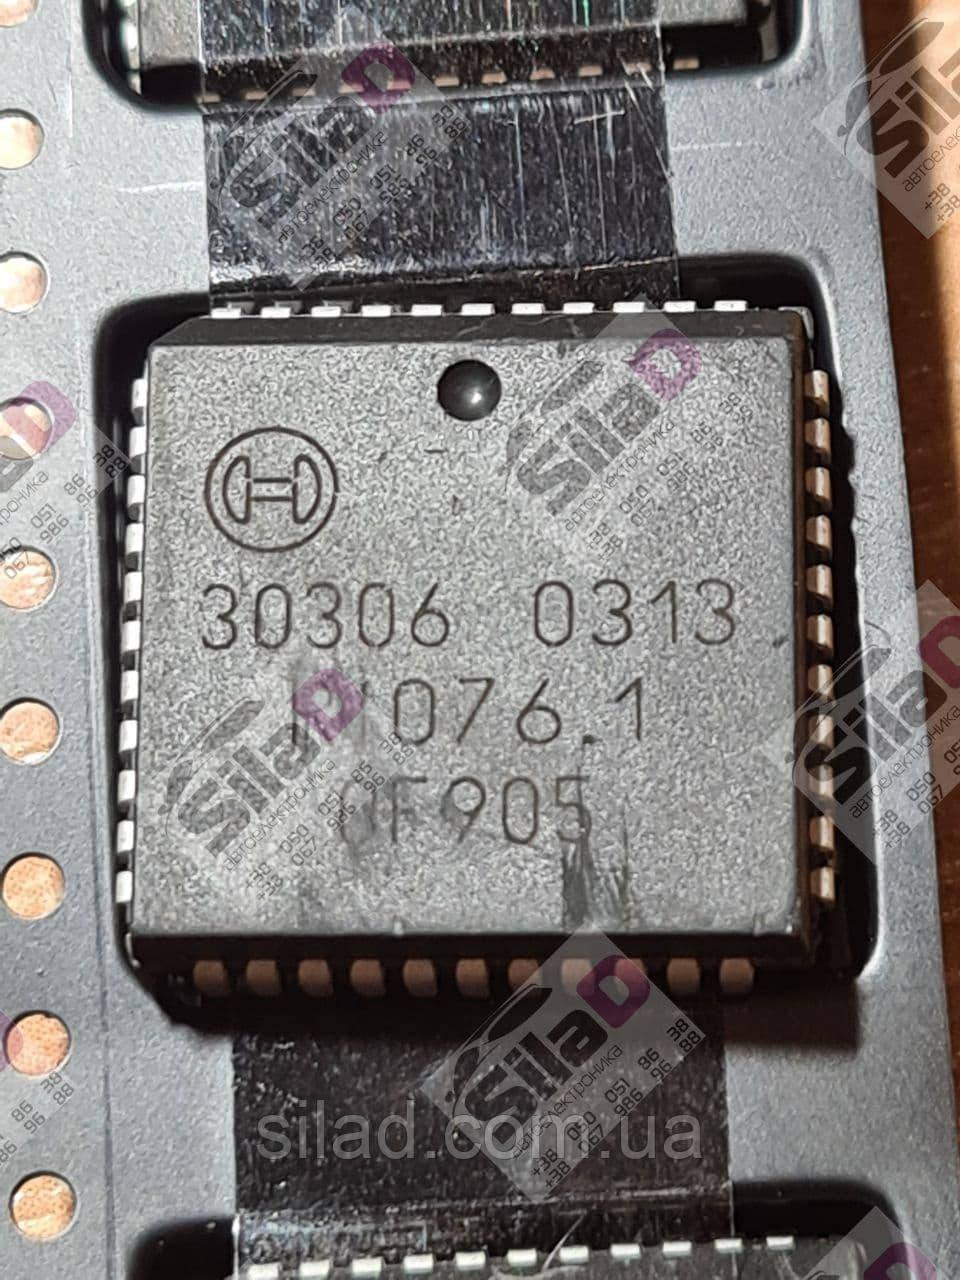 Микросхема Bosch 30306 корпус PLCC44